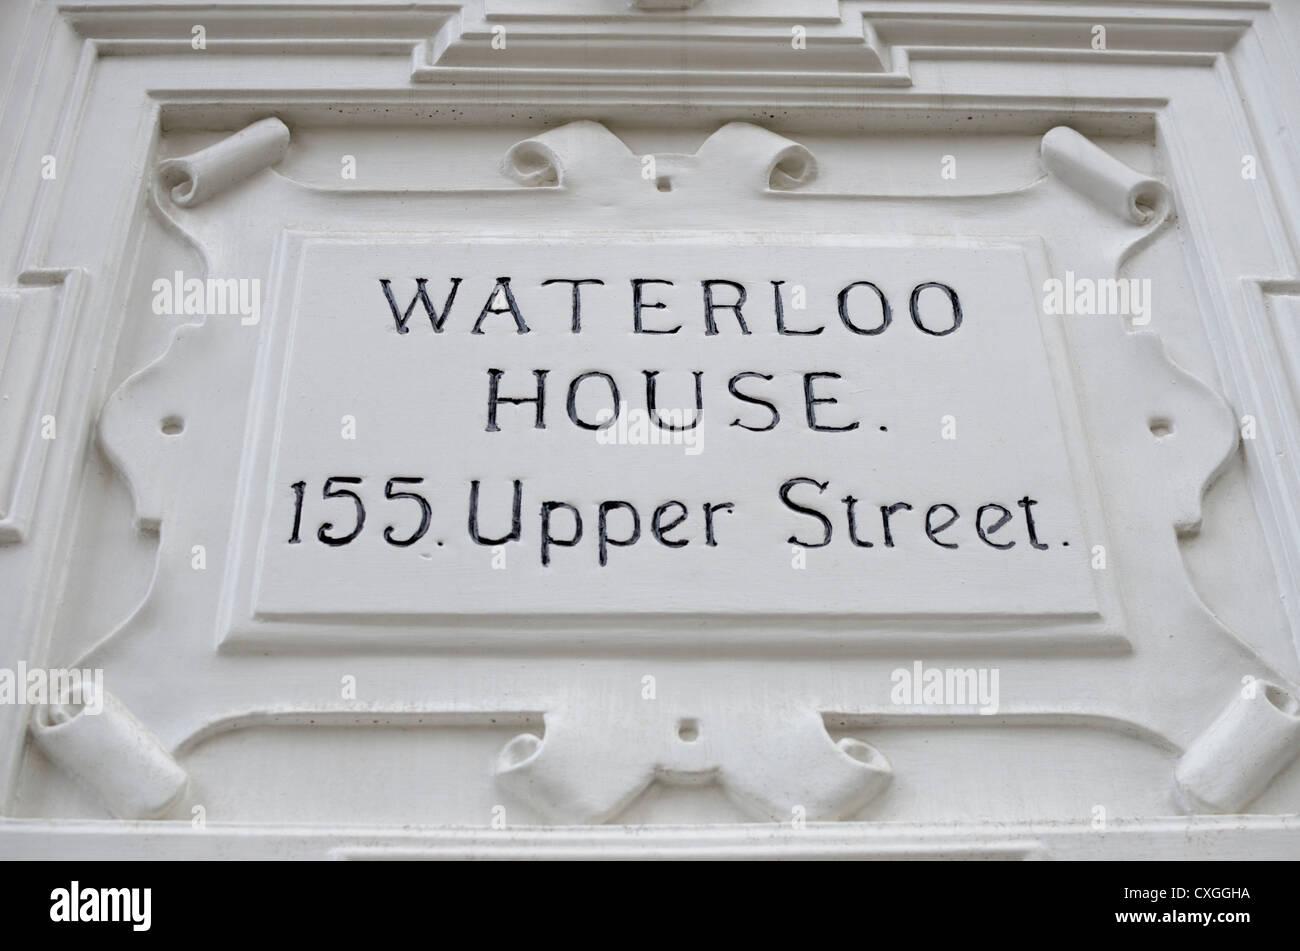 Waterloo House, 155 Upper Street, Islington, London, England - Stock Image